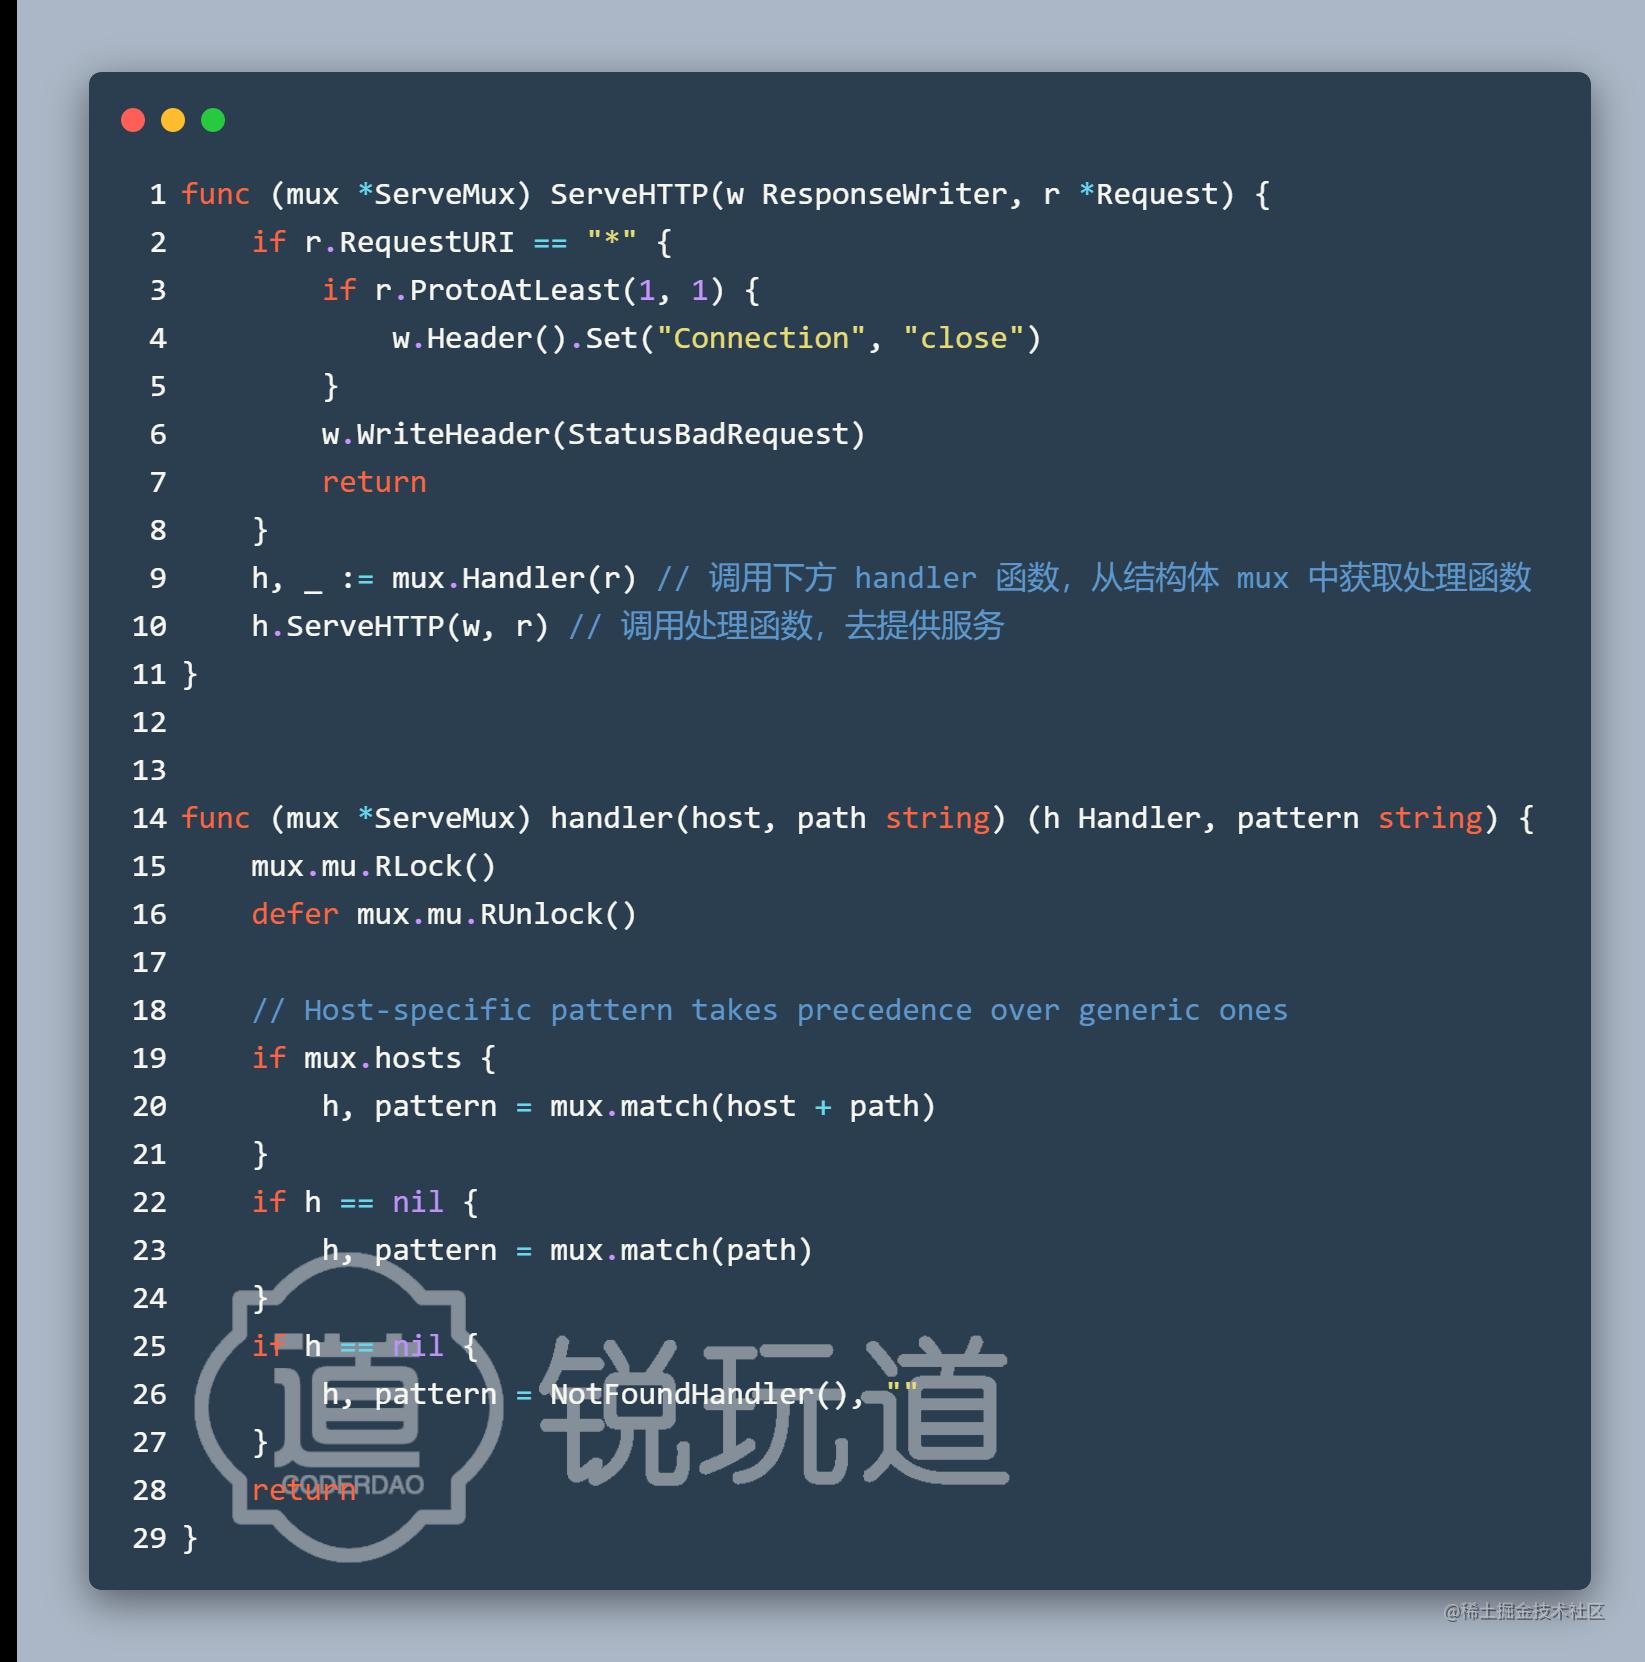 code-snapshot (3).png